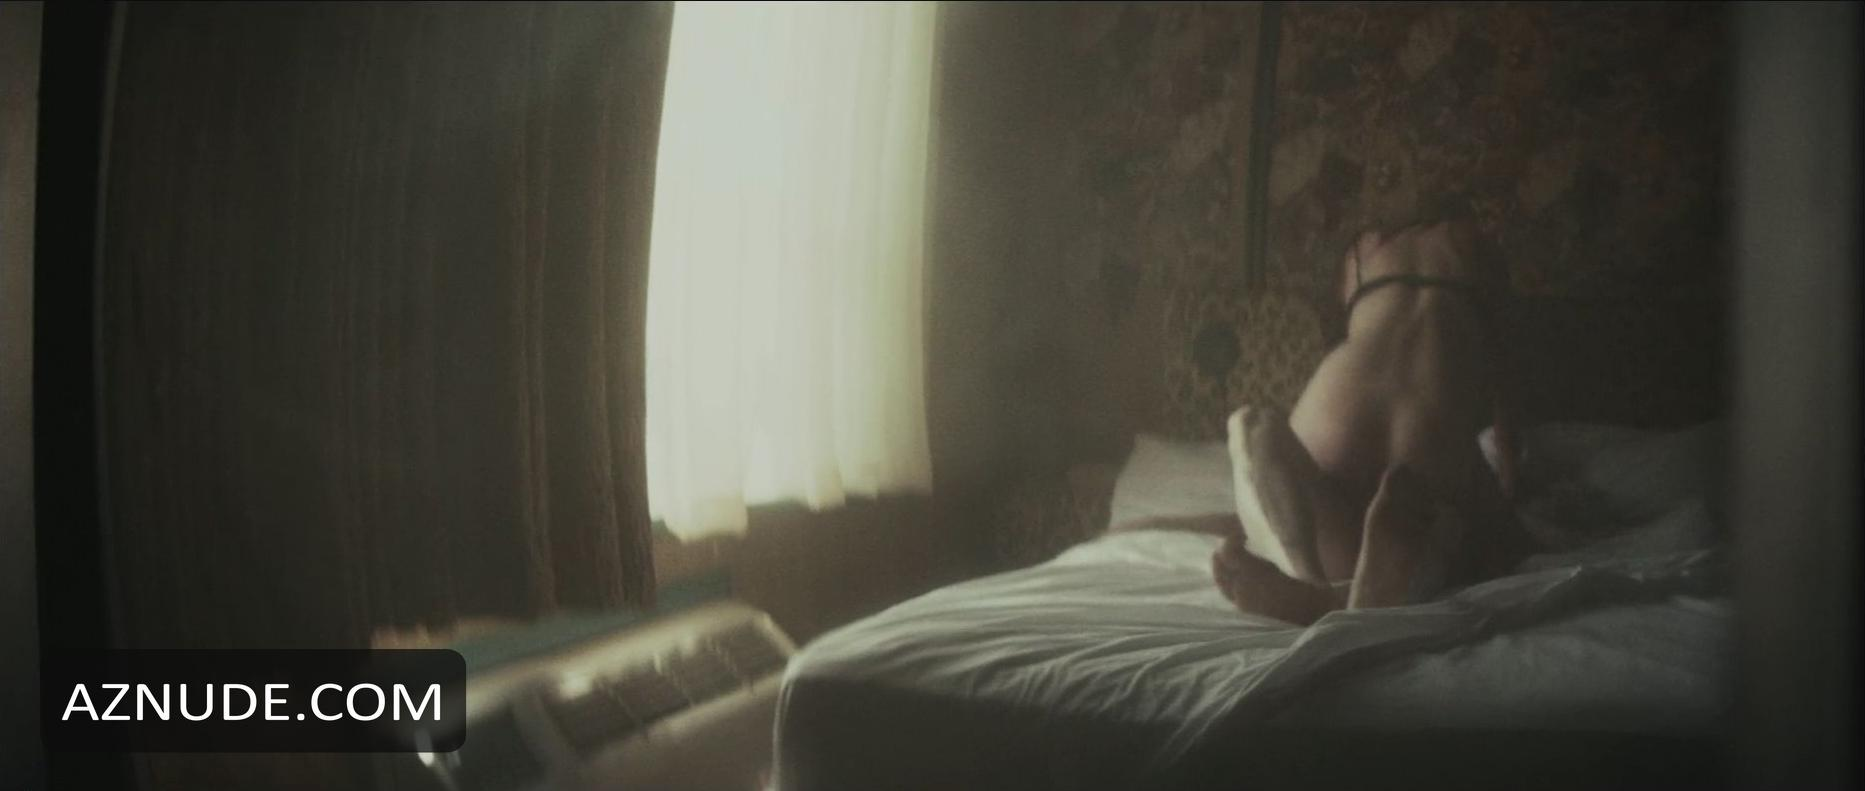 olivia wilde nude scene